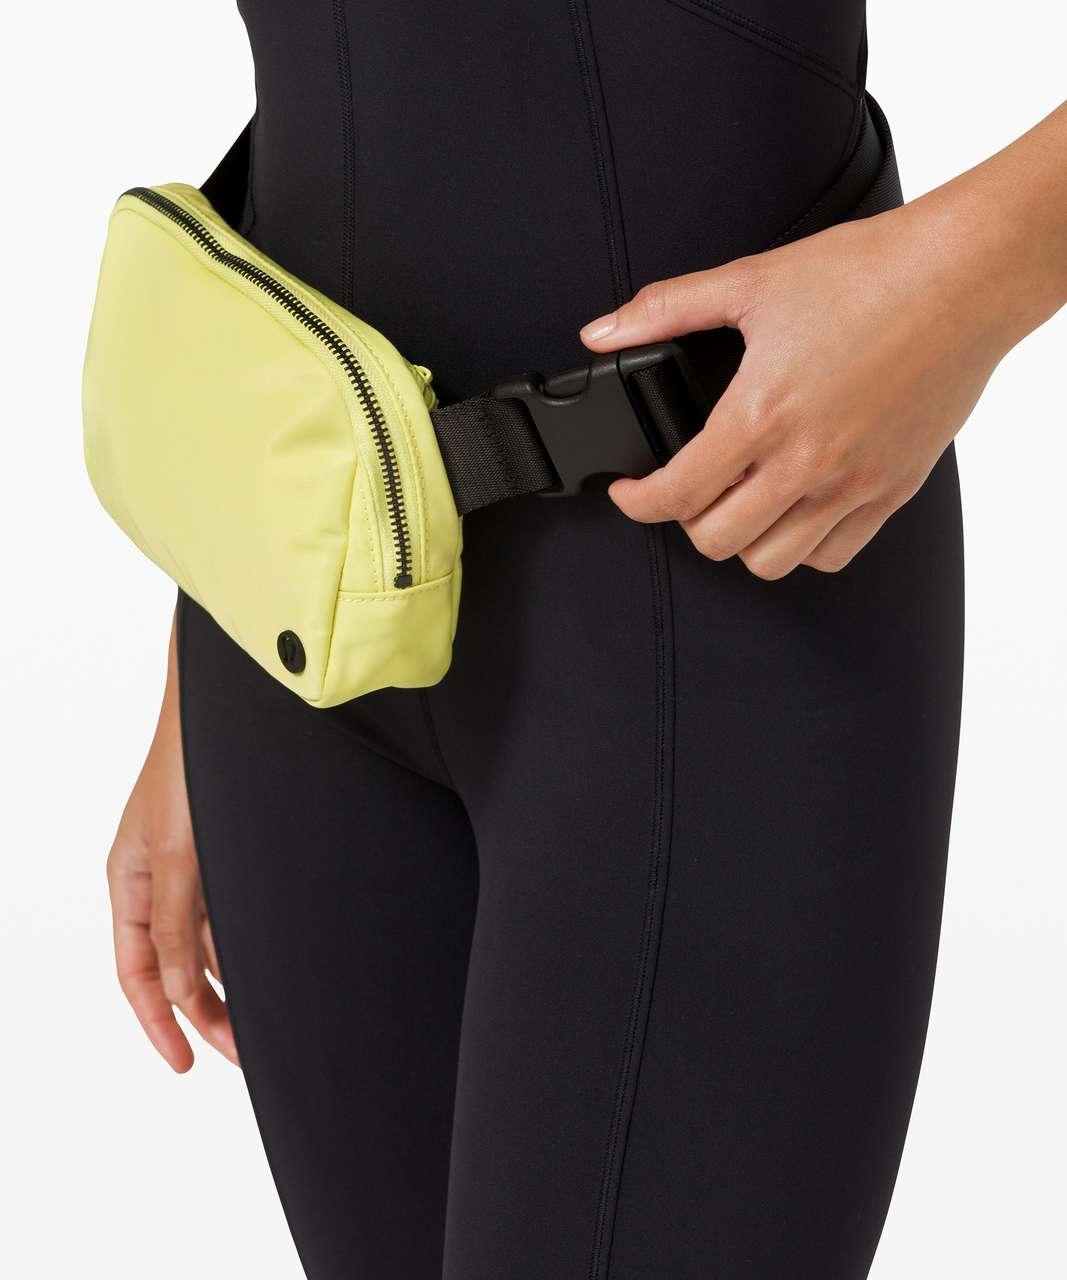 Lululemon Everywhere Belt Bag *1L - Lemon Vibe